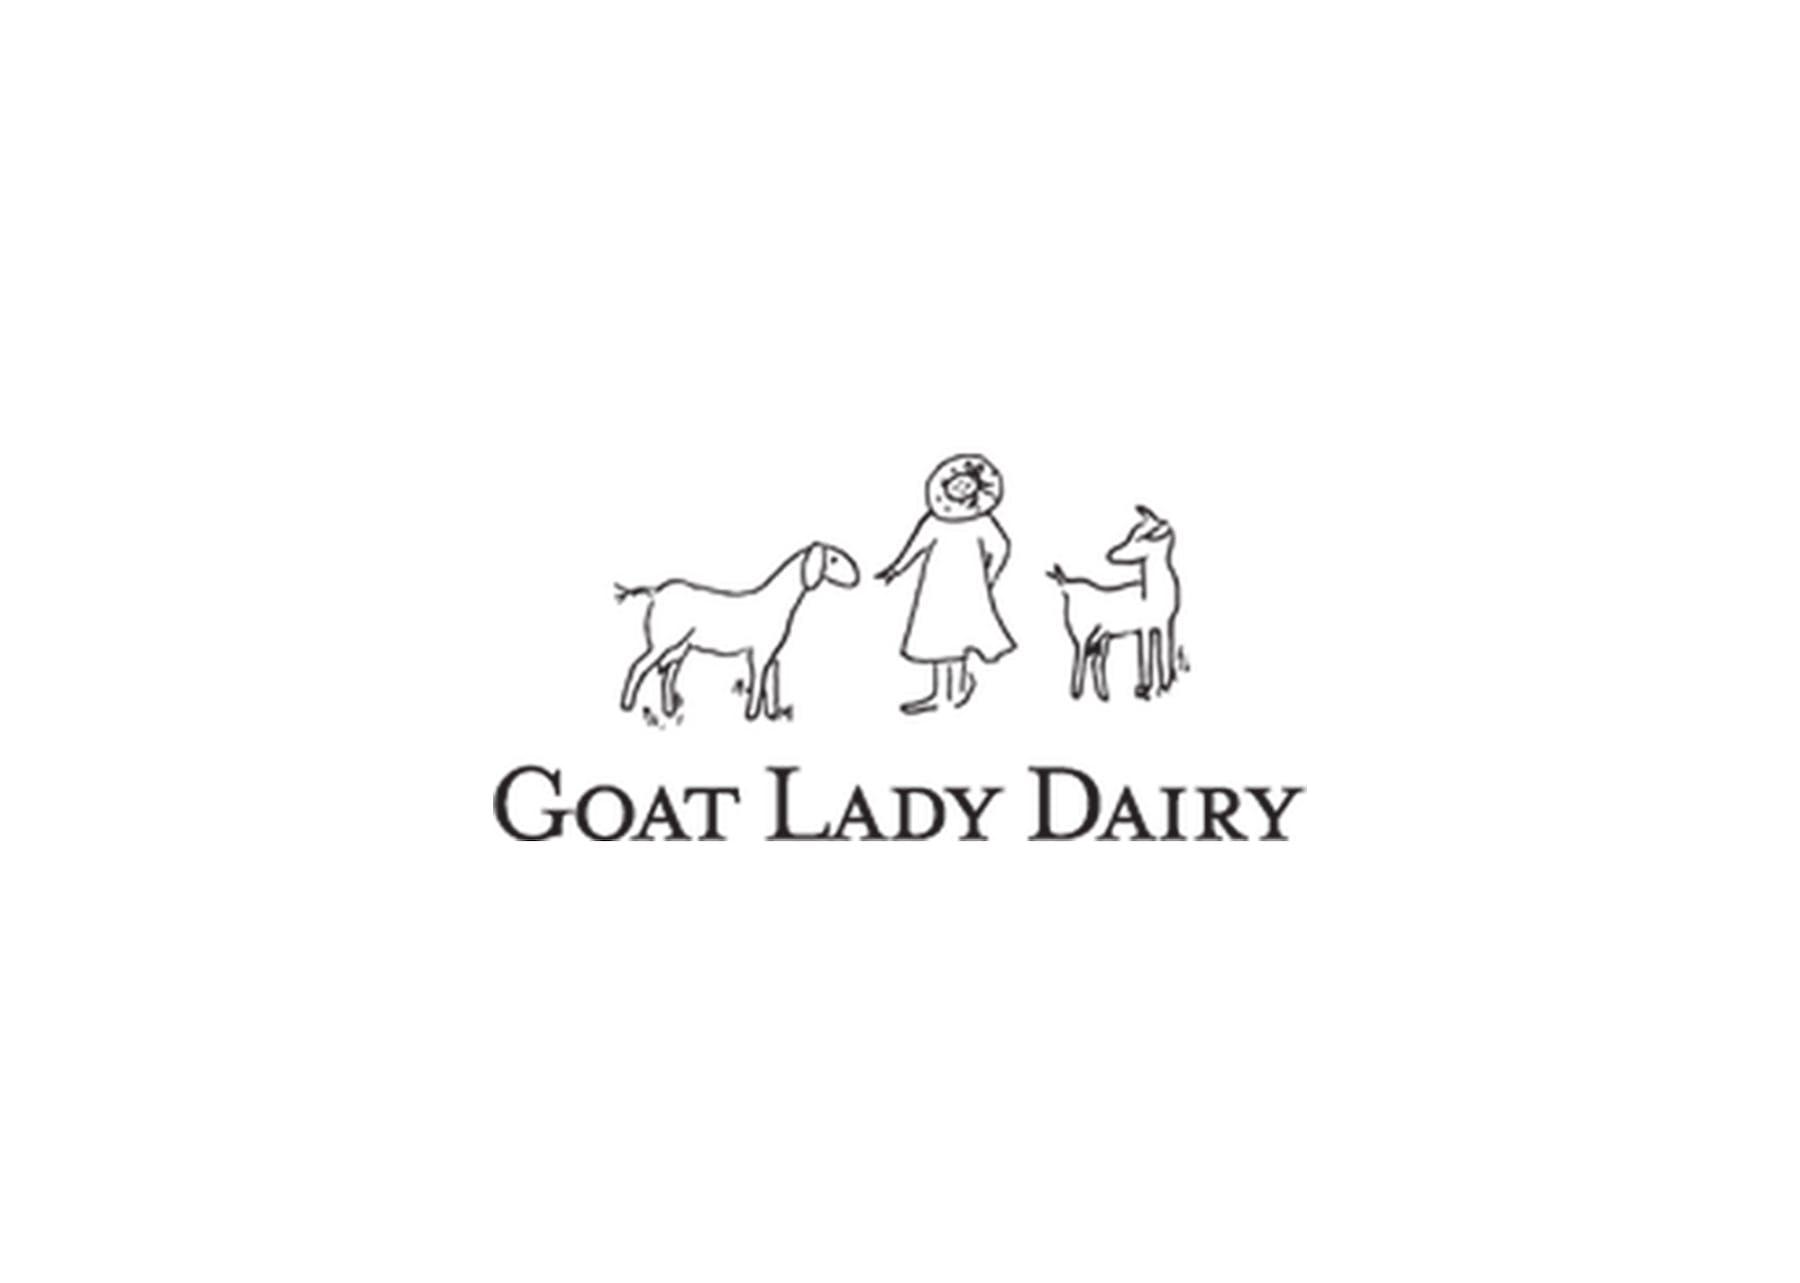 Goat Lady Dairy Logo